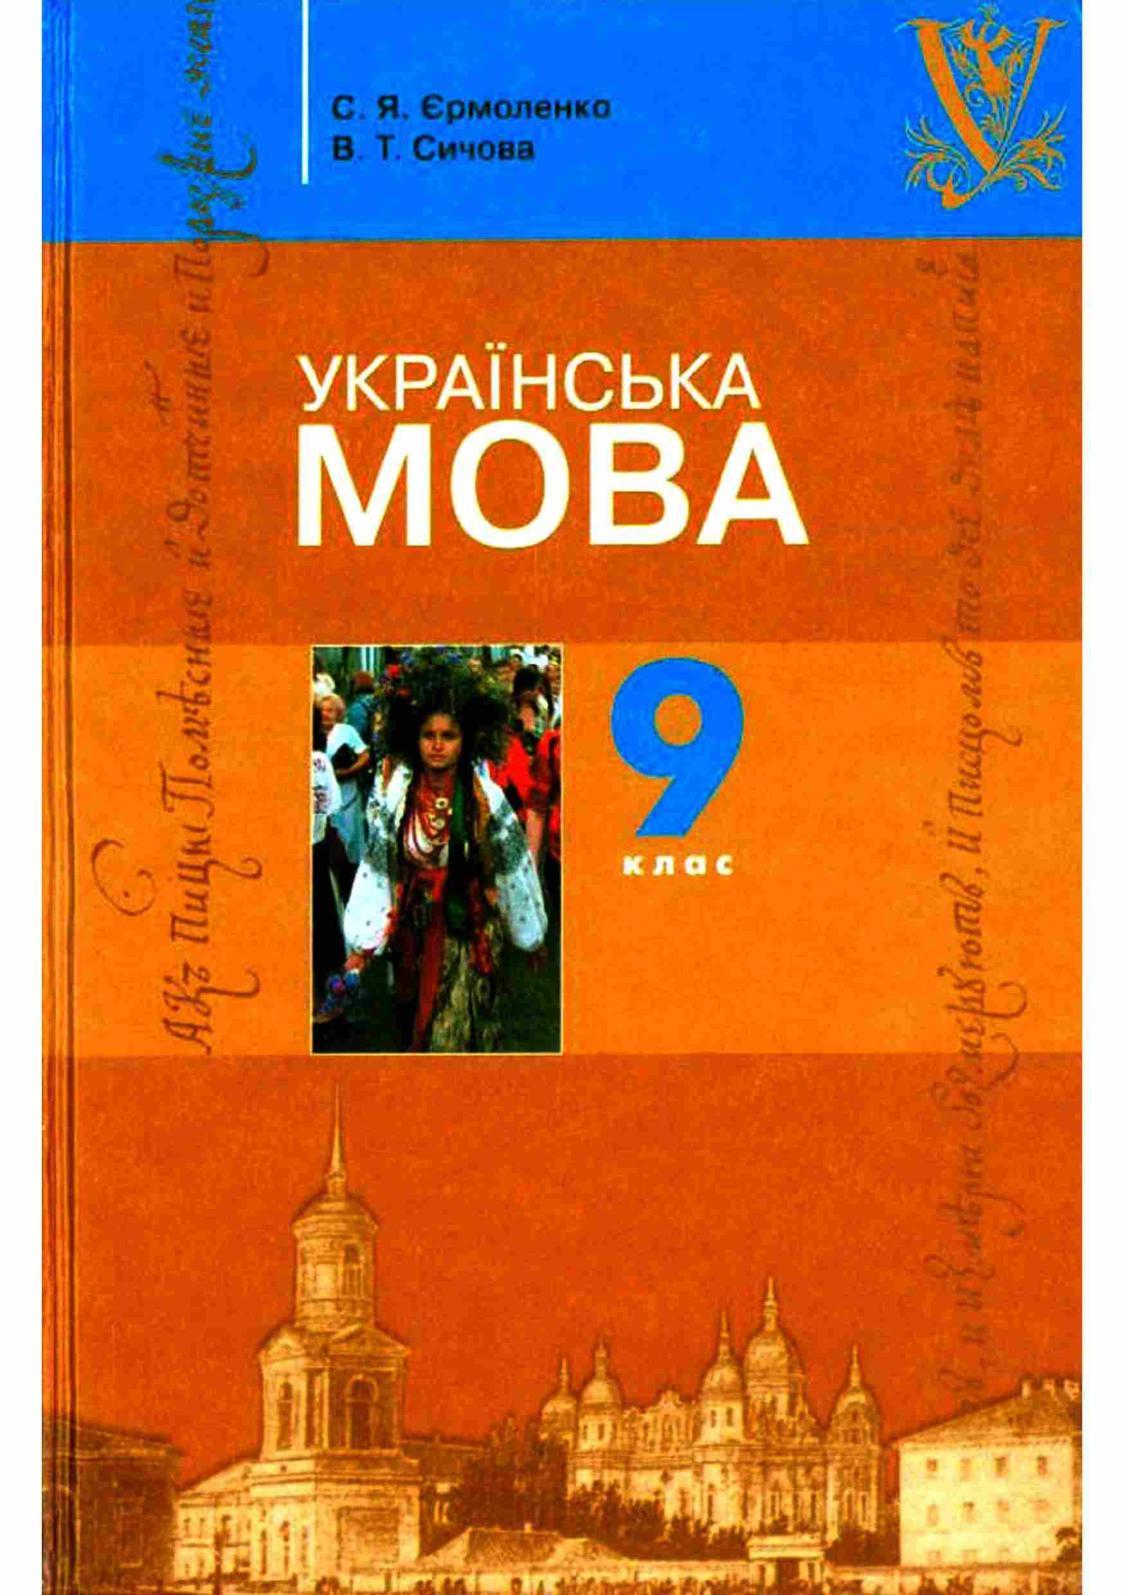 Calaméo - 9 клас. Українська мова (Єрмоленко d2f84988b5489